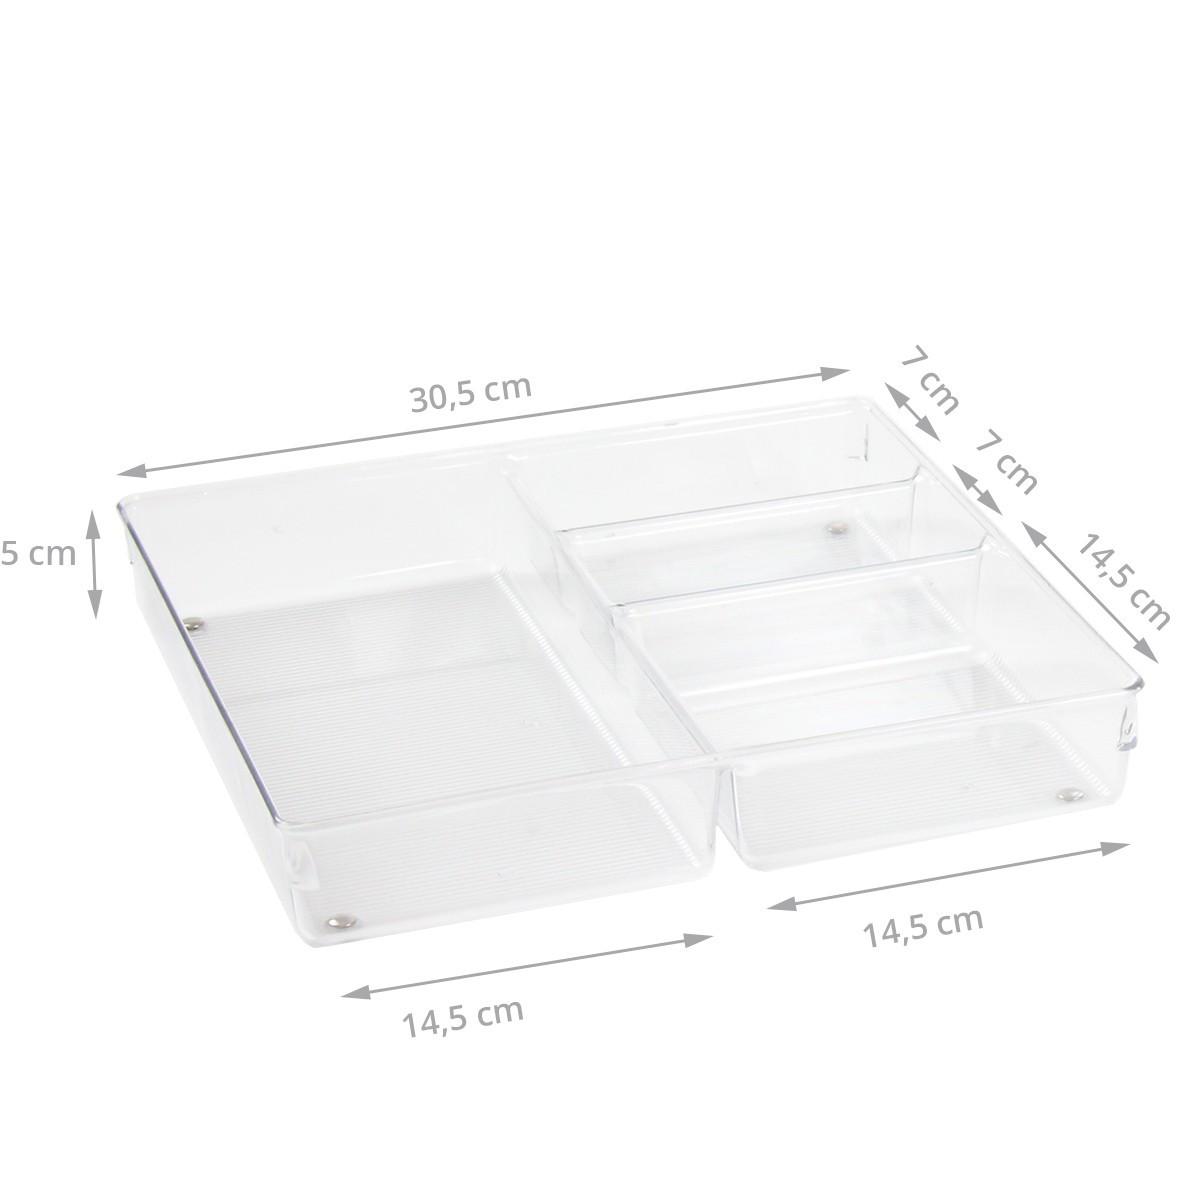 organisateur de tiroir transparent rangement couverts. Black Bedroom Furniture Sets. Home Design Ideas